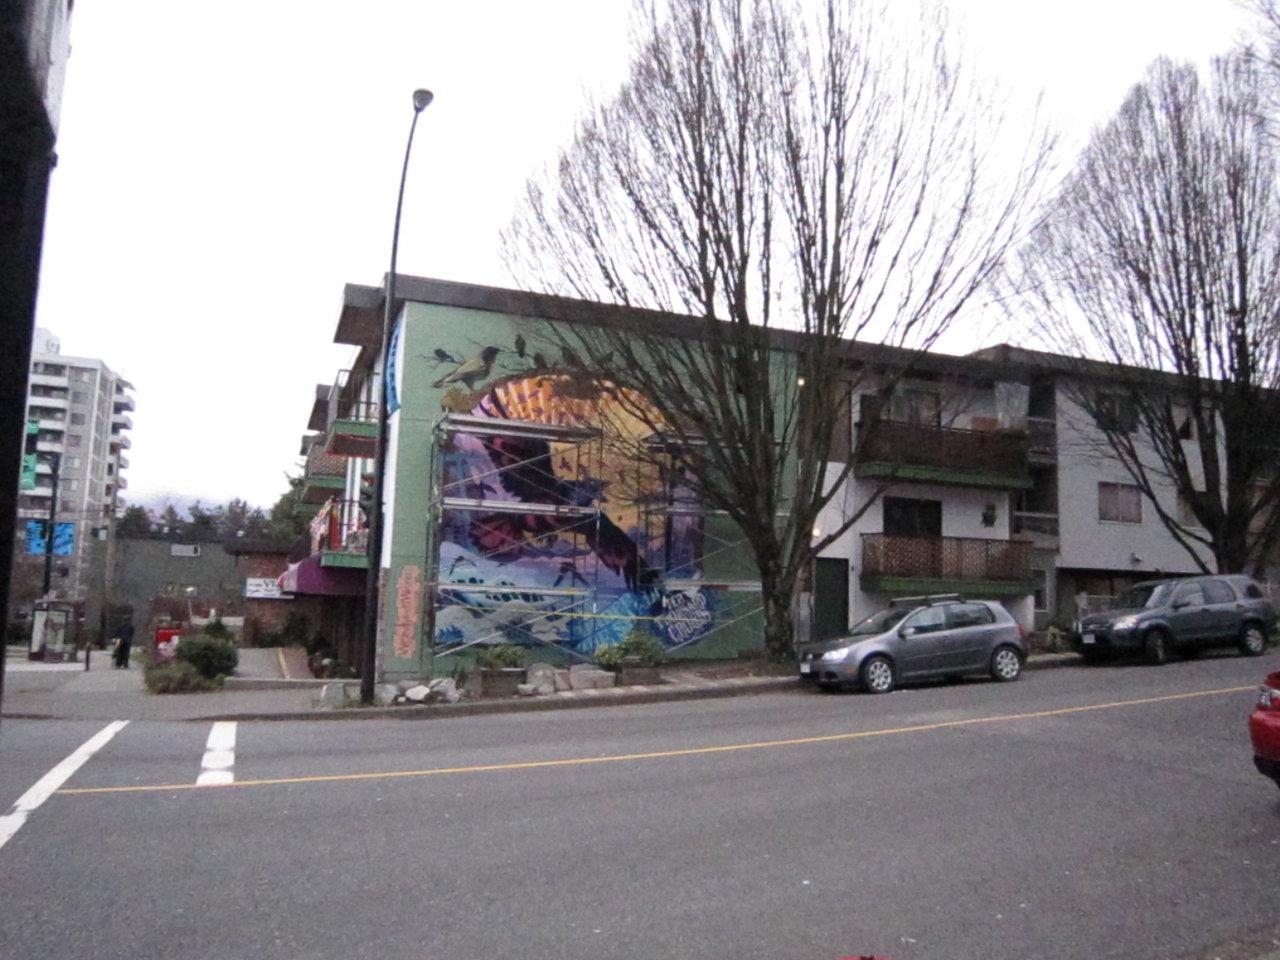 10,000 crows mural